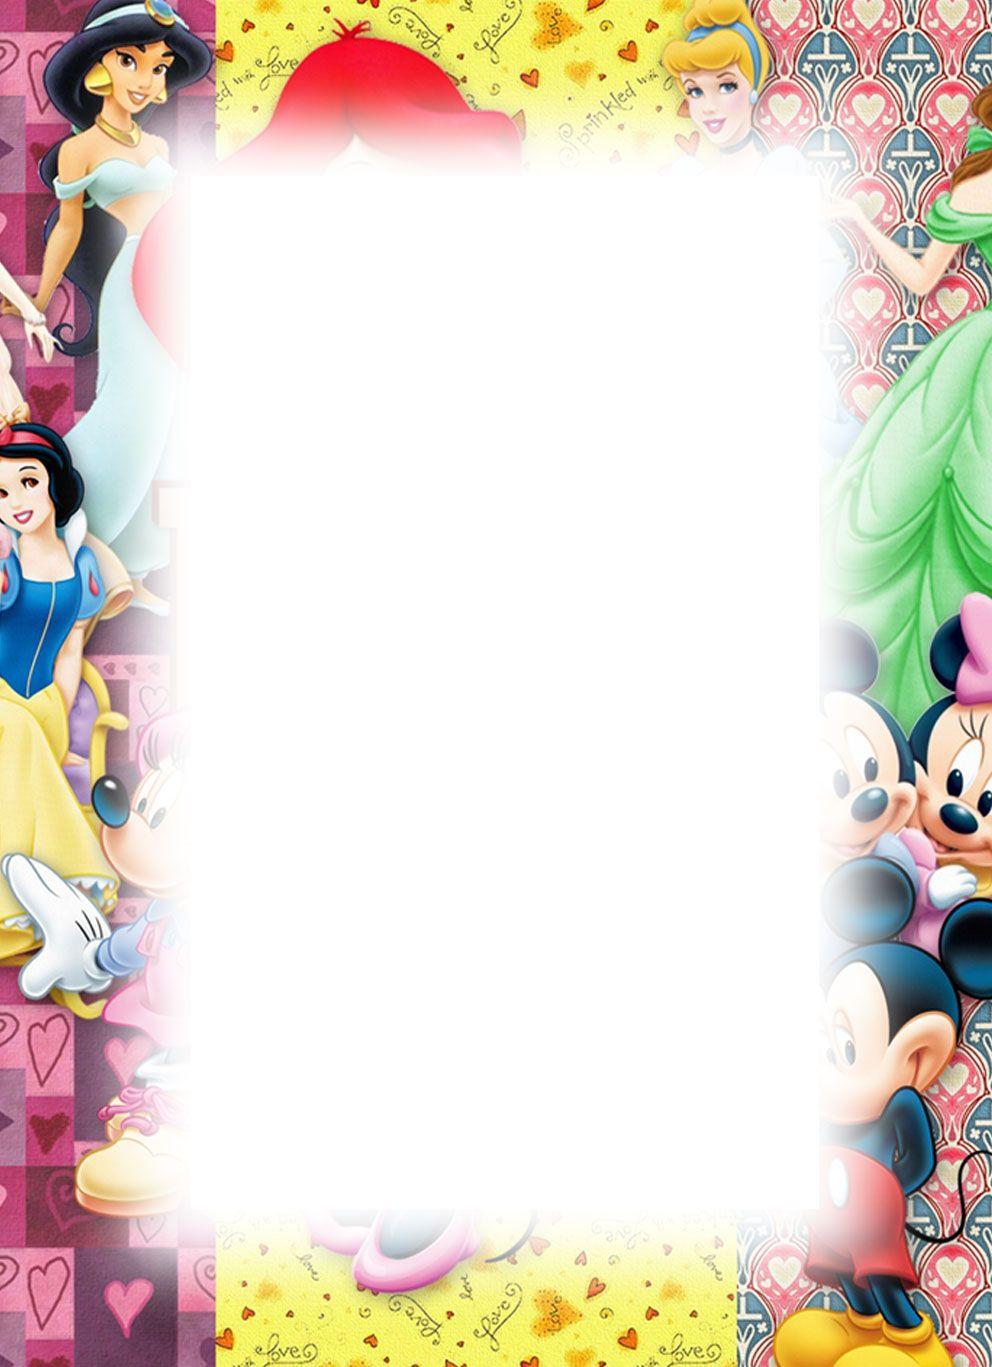 Motivo Personajes Disney | Disney | Pinterest | Personajes disney ...